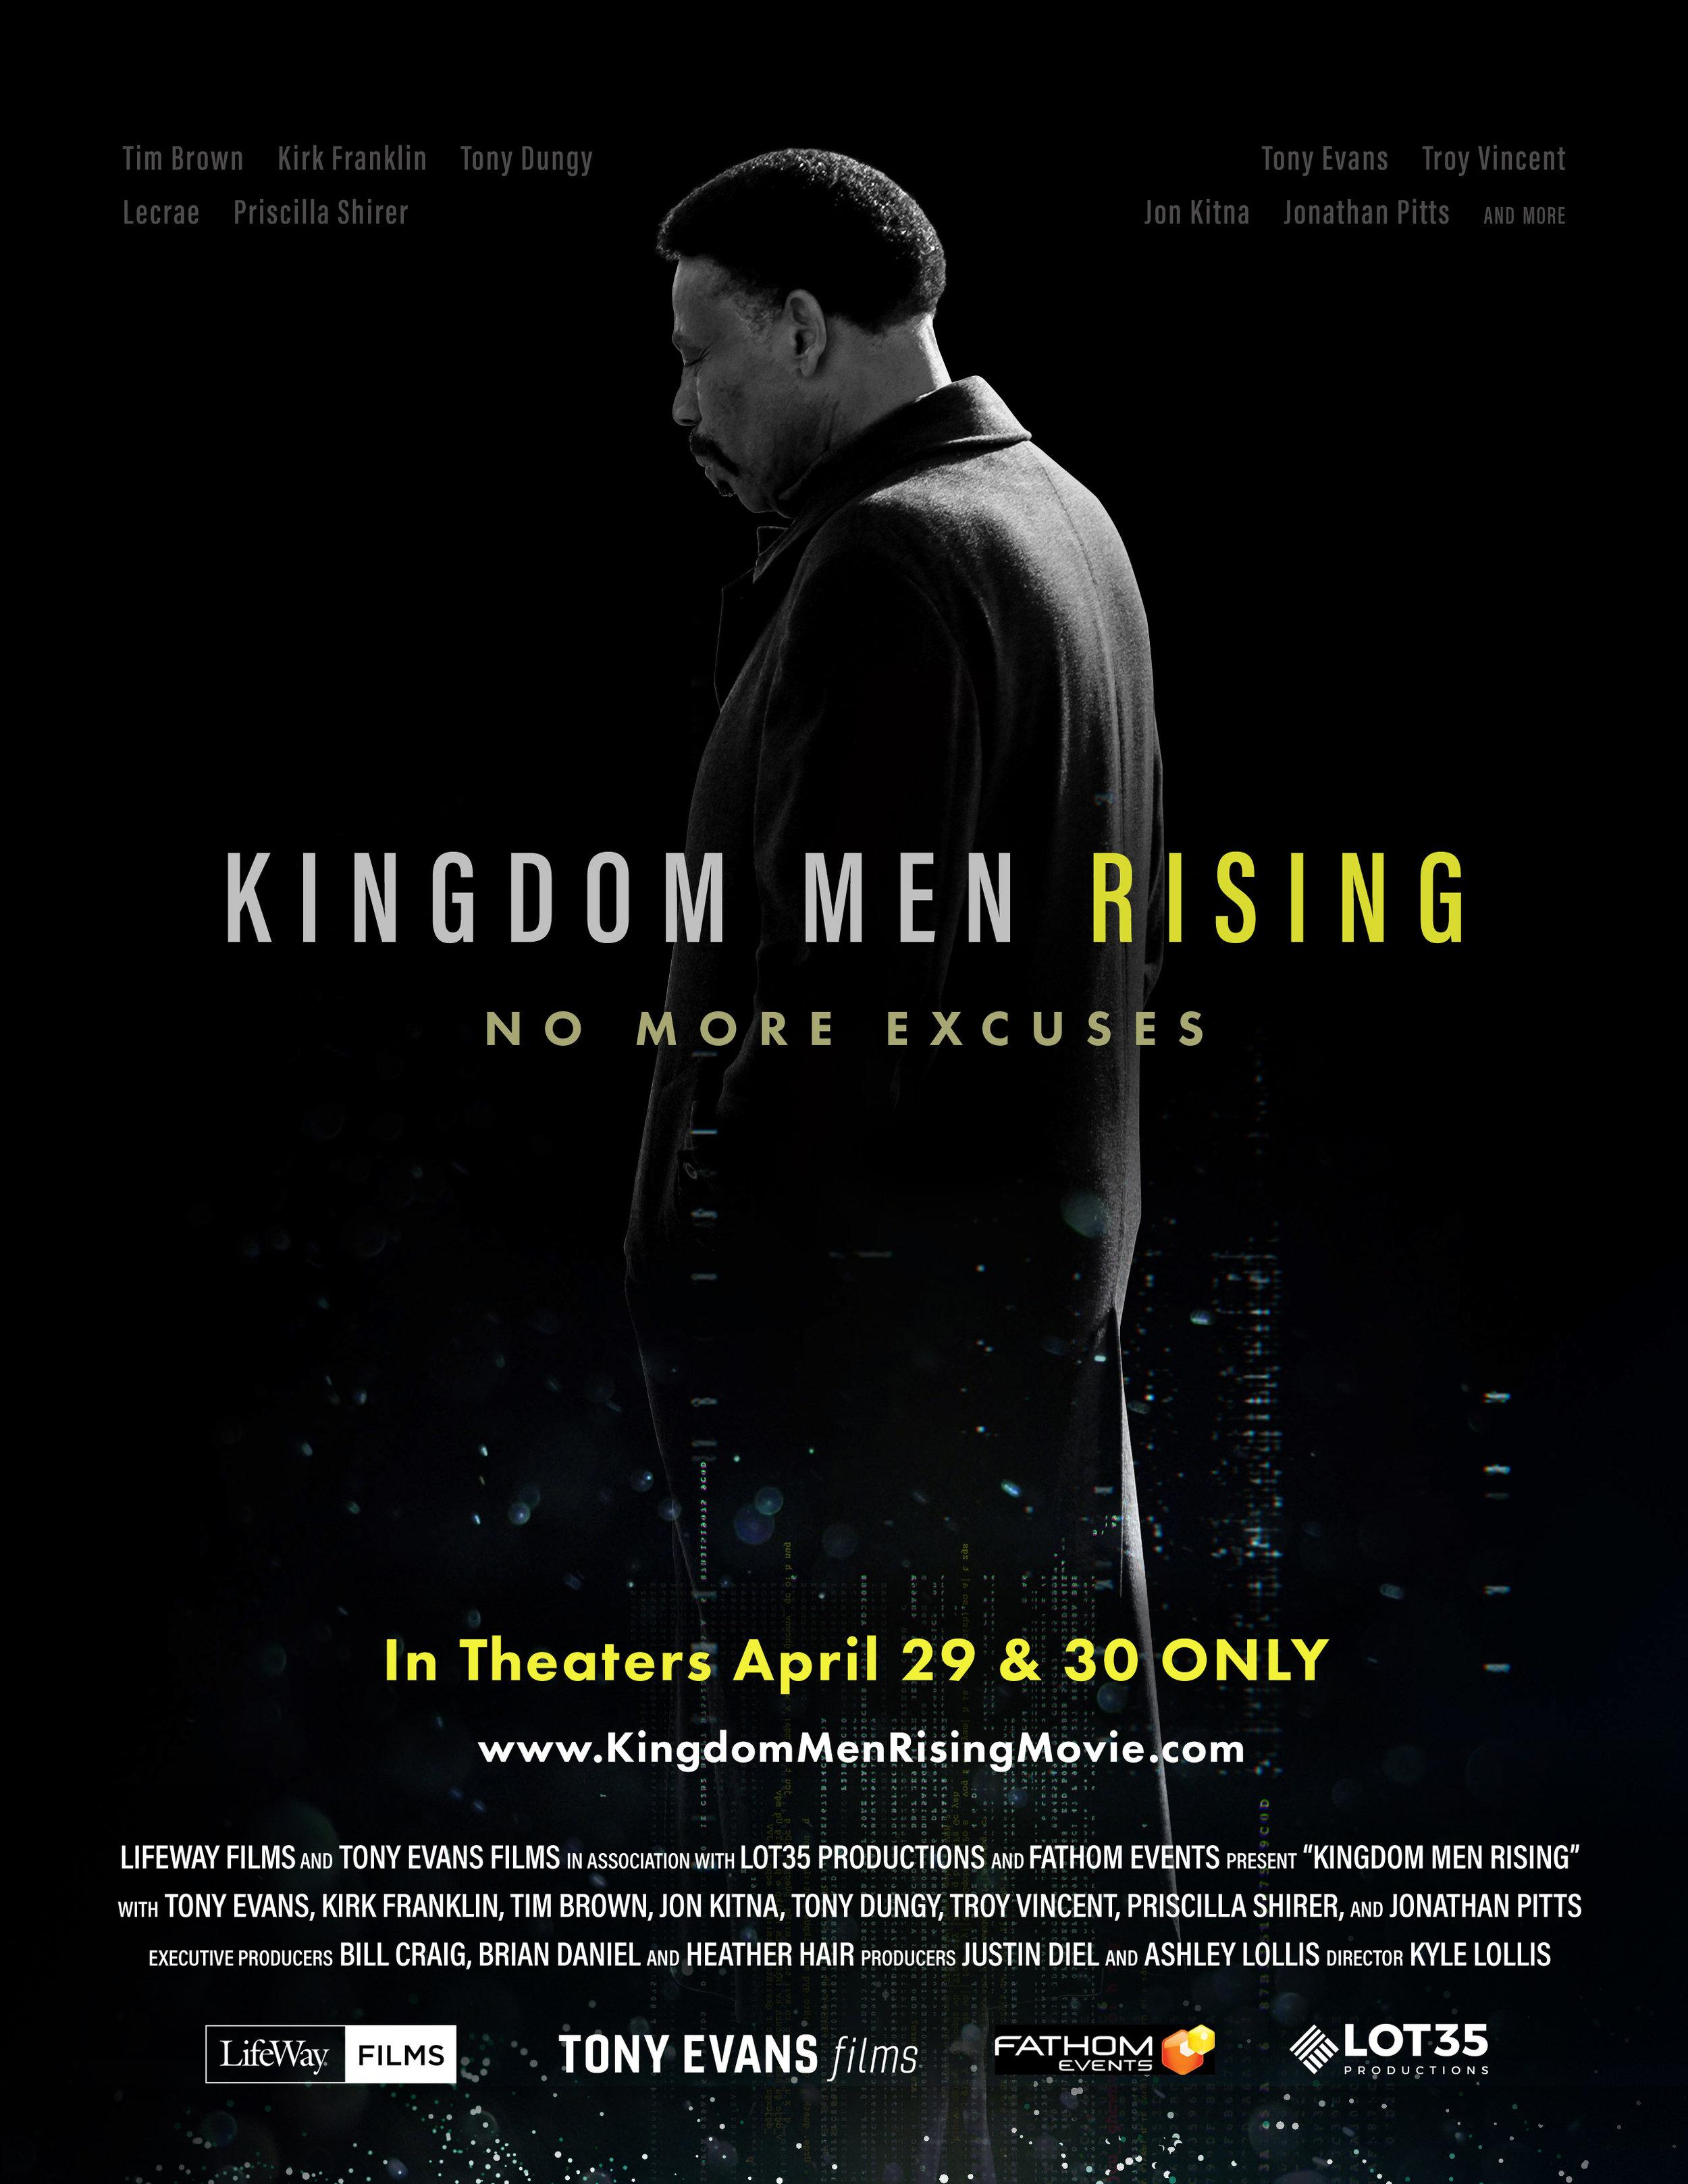 Kingdom Men Rising Poster.jpg